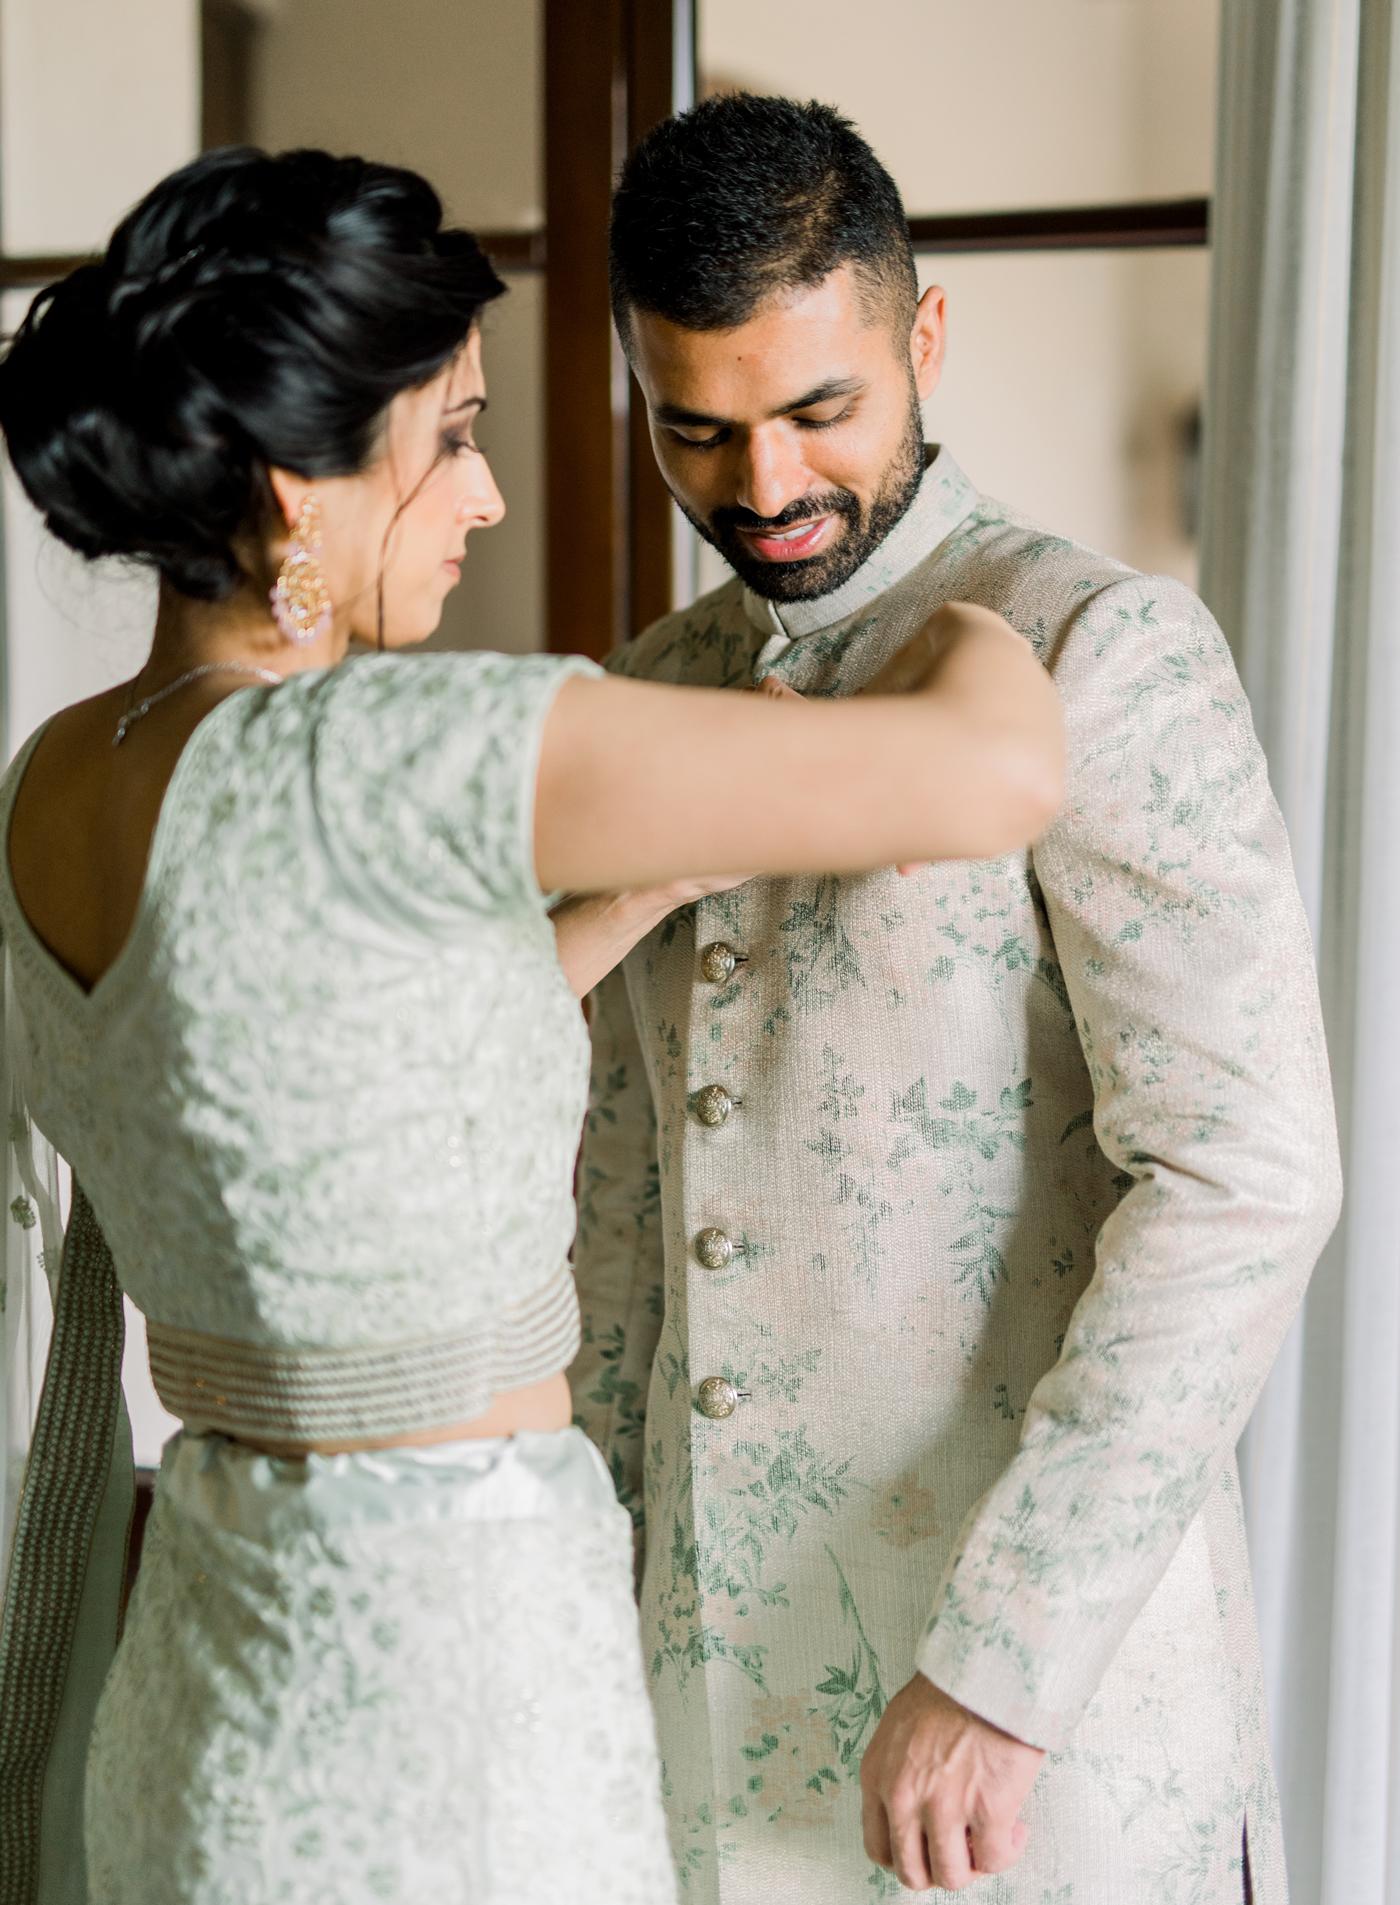 groom getting ready before wedding ceremony